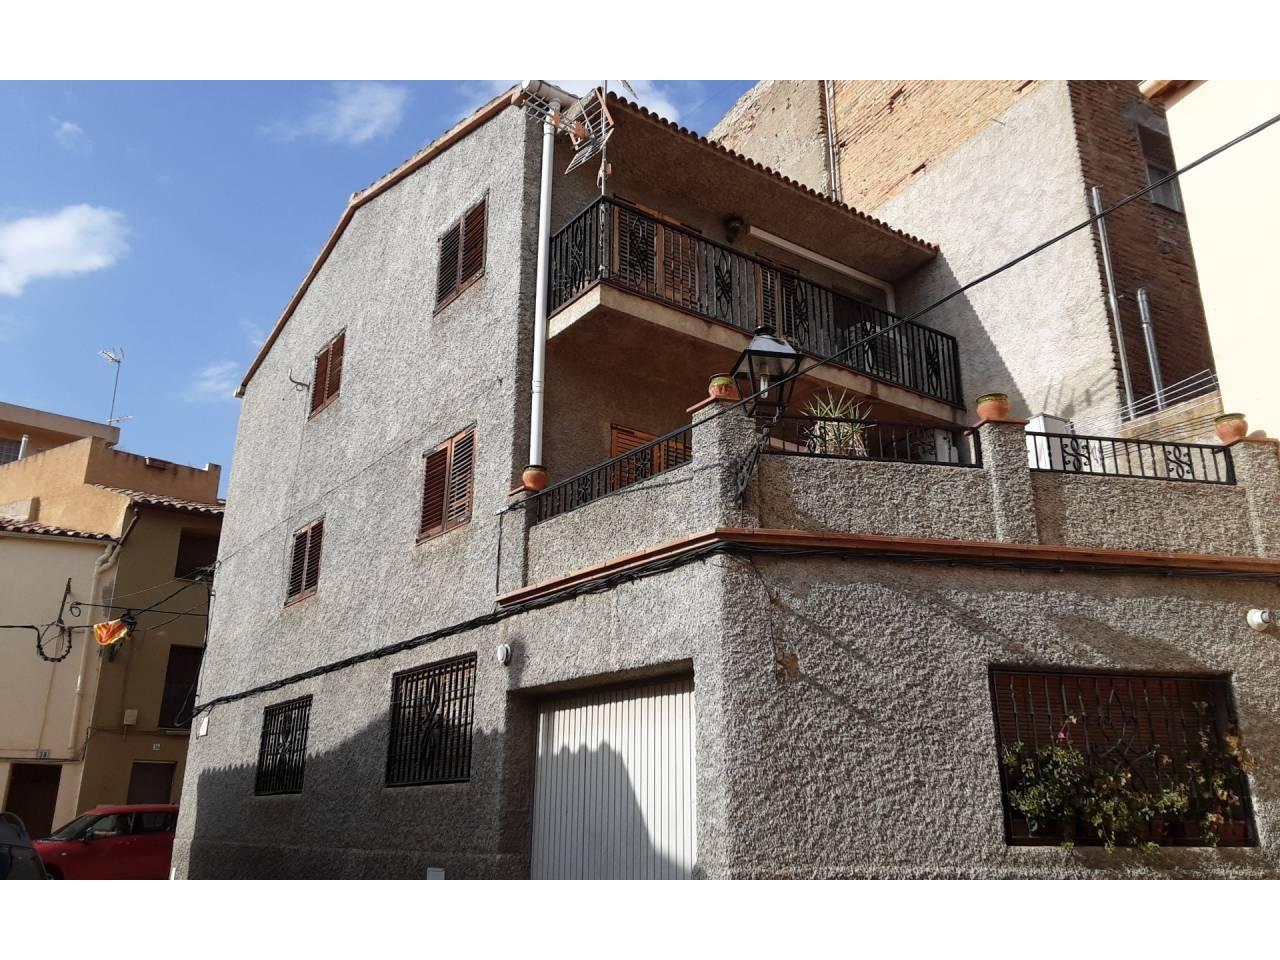 Casa  Calle piro, 25. Encantadora casa situada en el centro de gratallops , priorat .